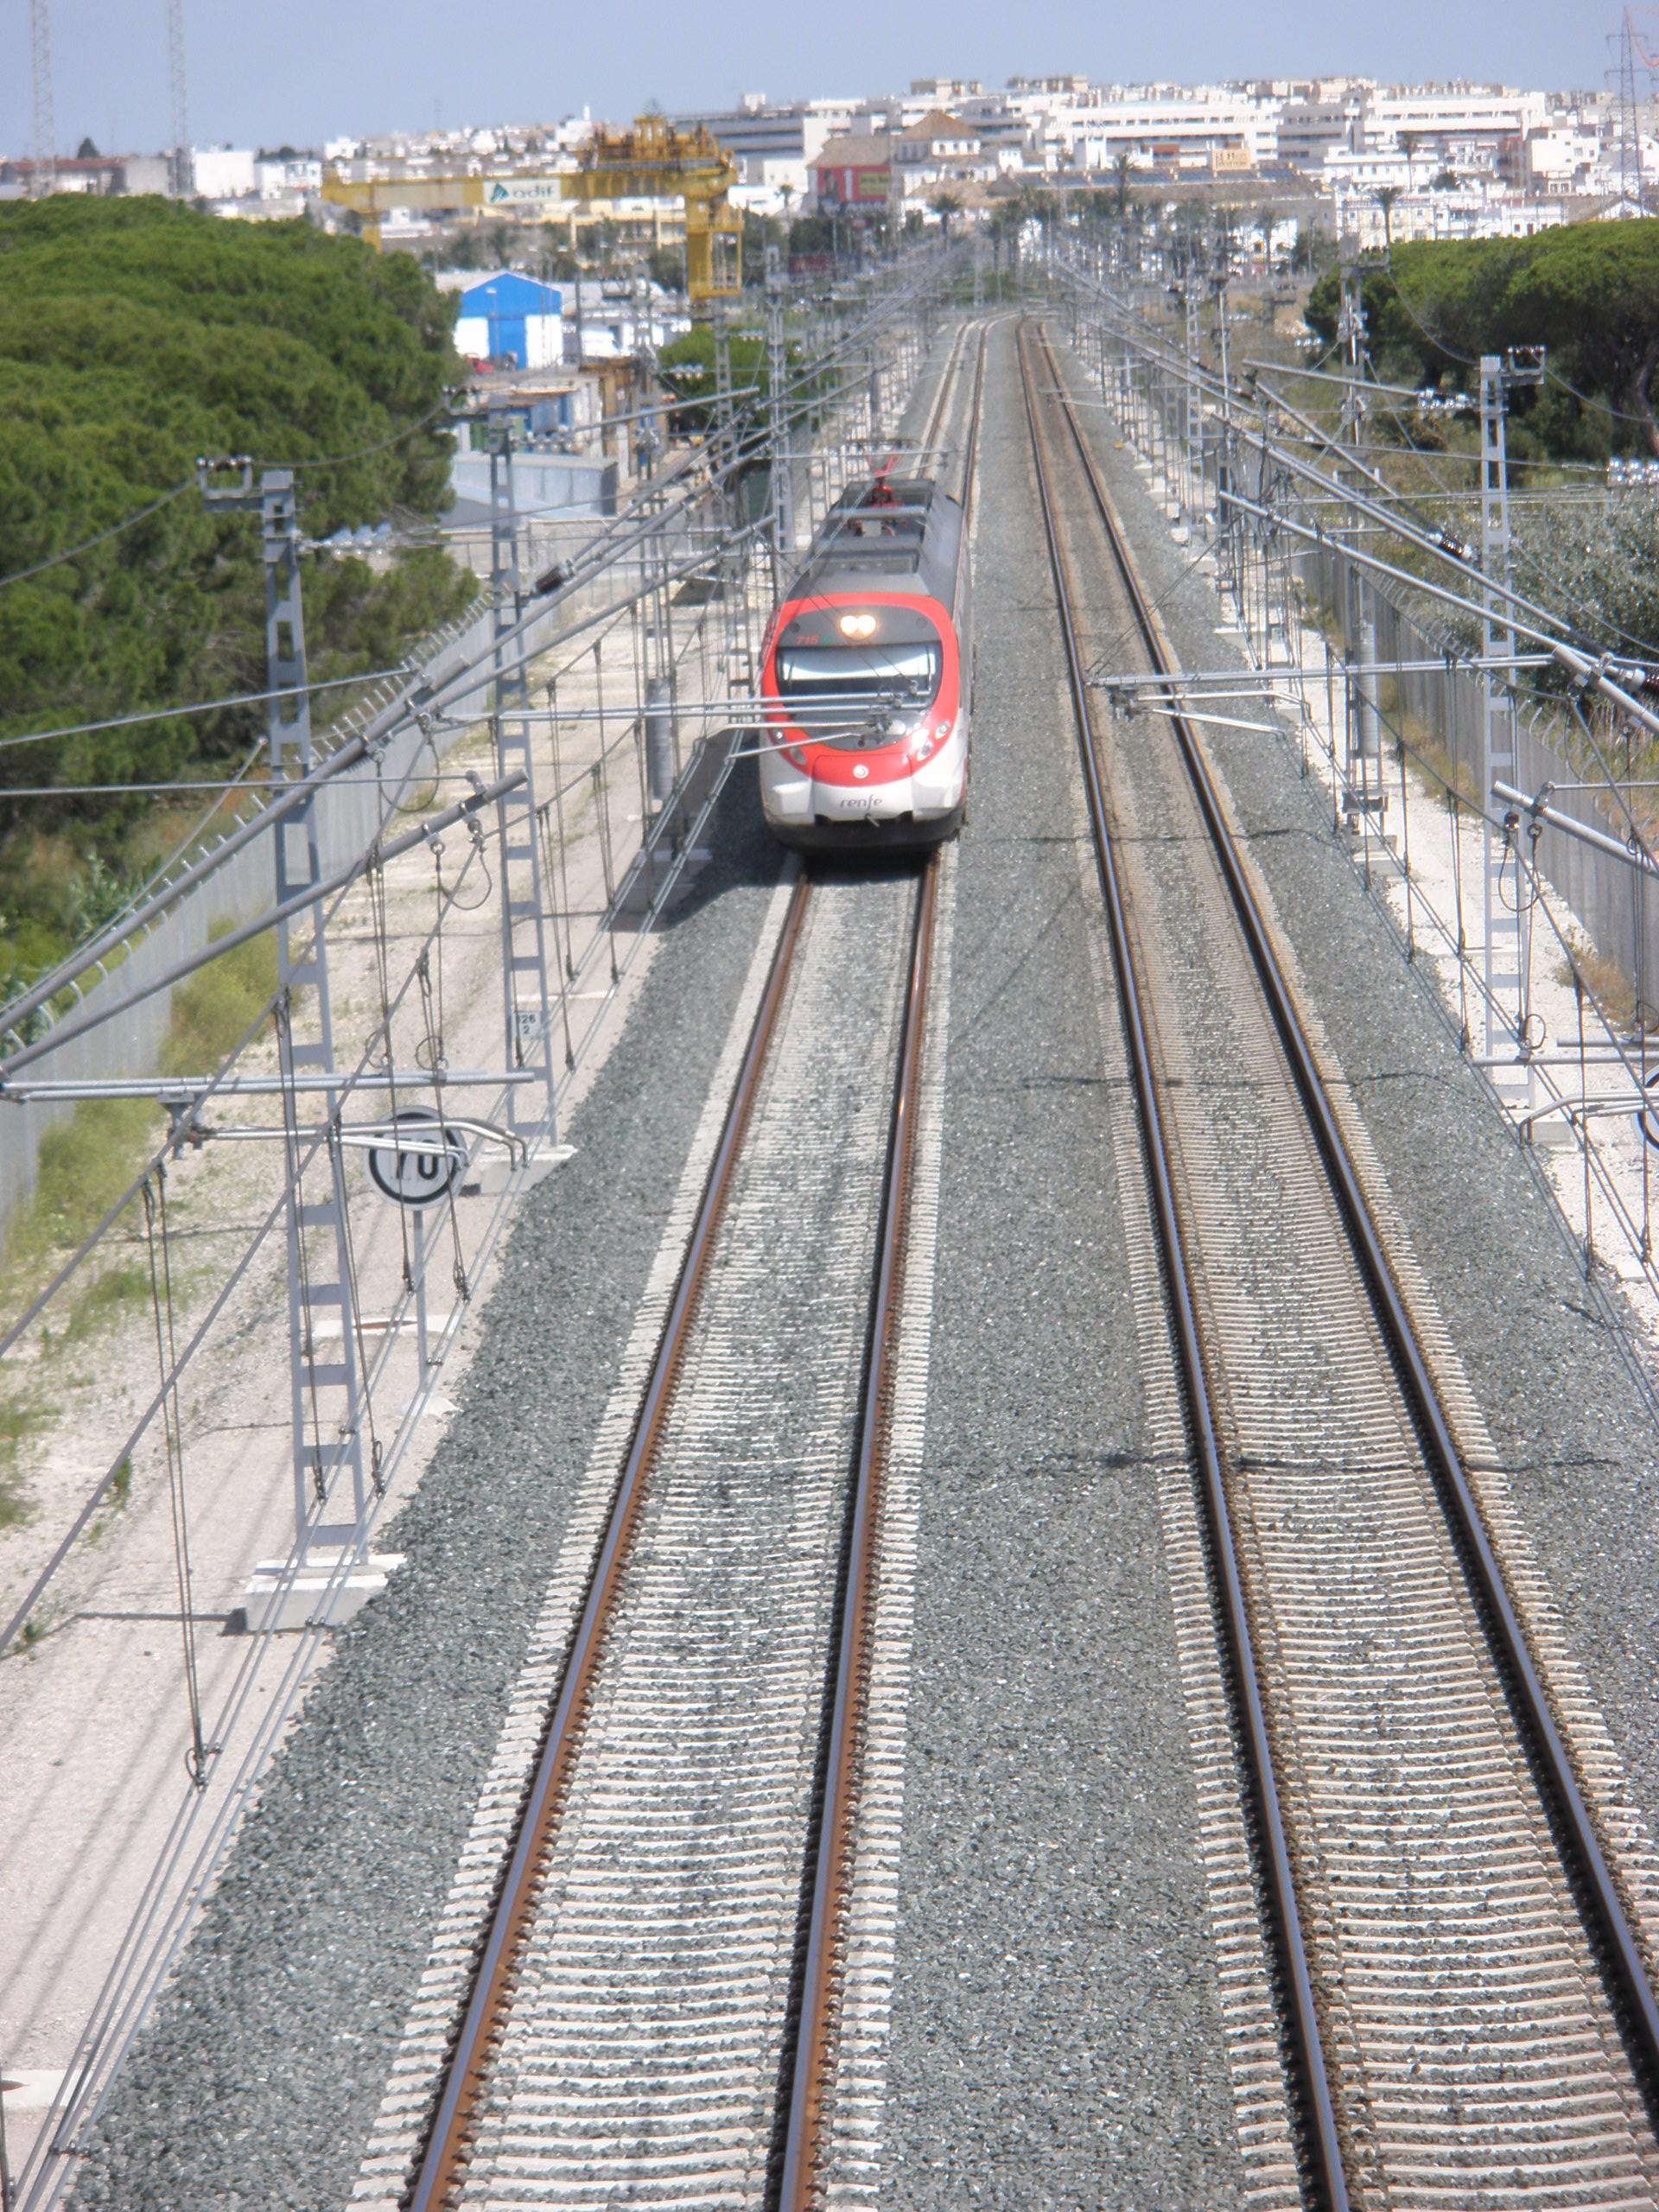 File tren llegando a la estaci n de trenes de valdelagrana el puerto de santa mar a c diz - Estacion de tren puerto de santa maria ...